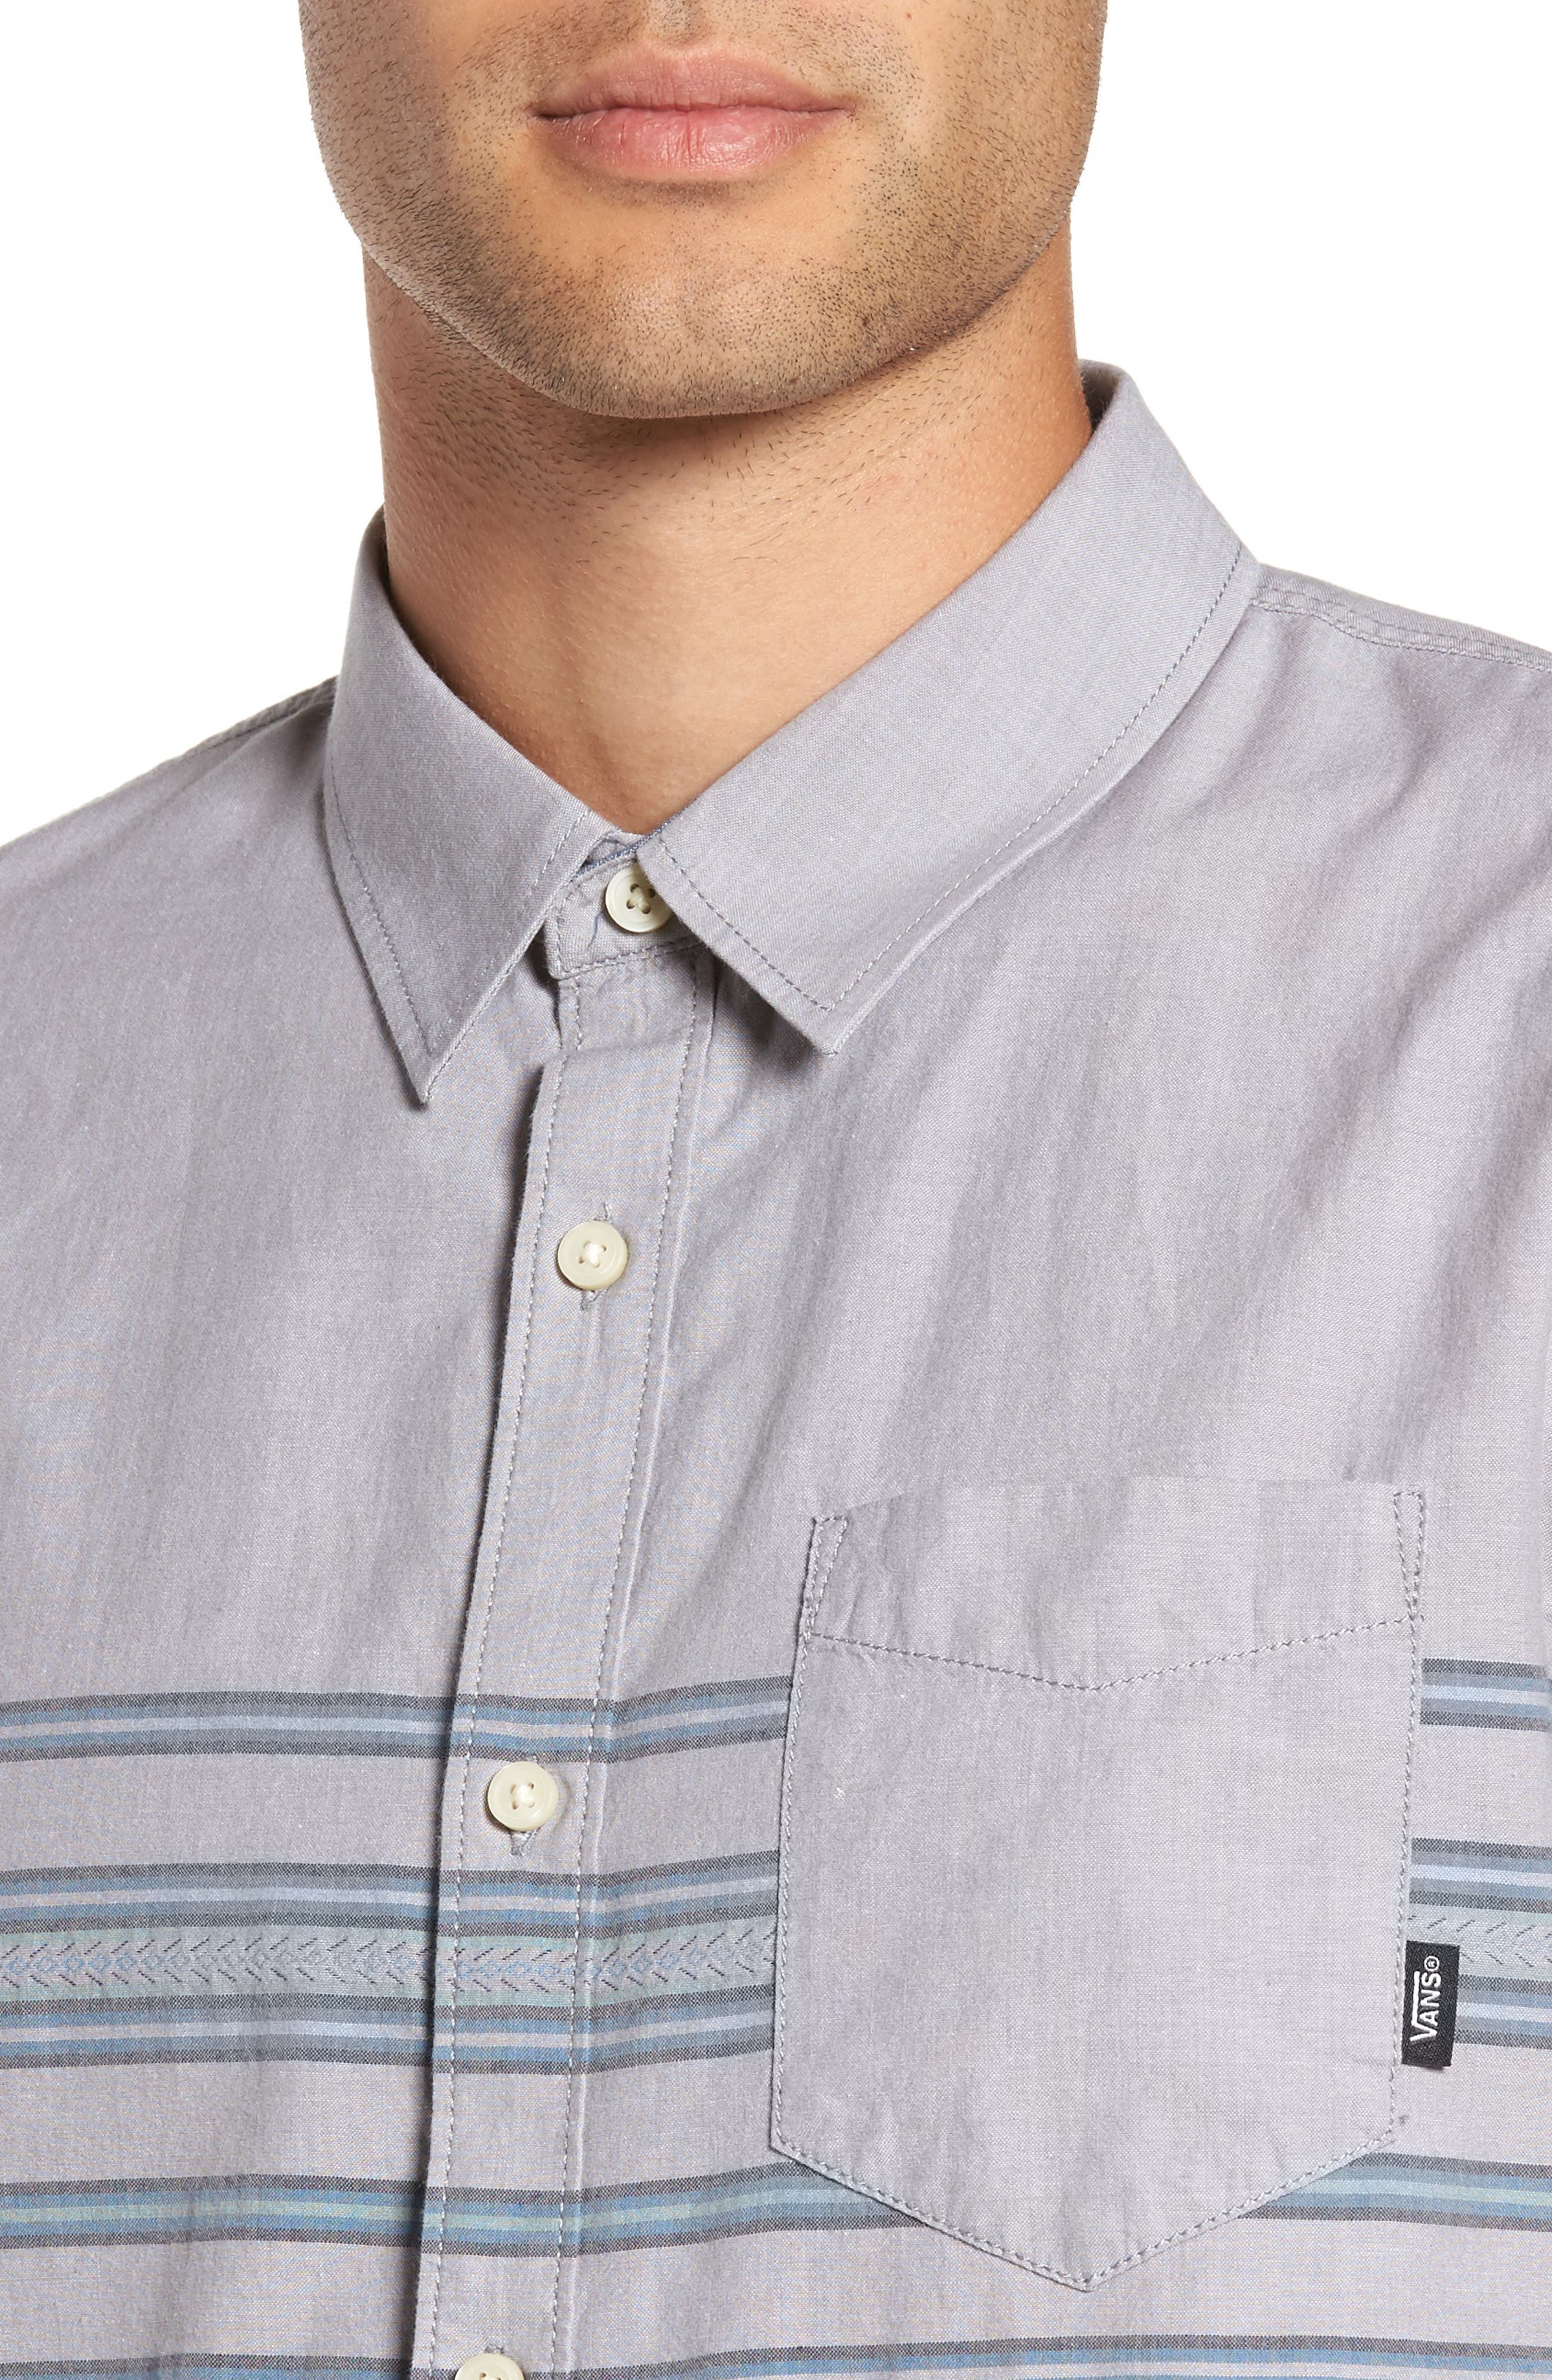 Benmore Striped Woven Shirt,                             Alternate thumbnail 4, color,                             021